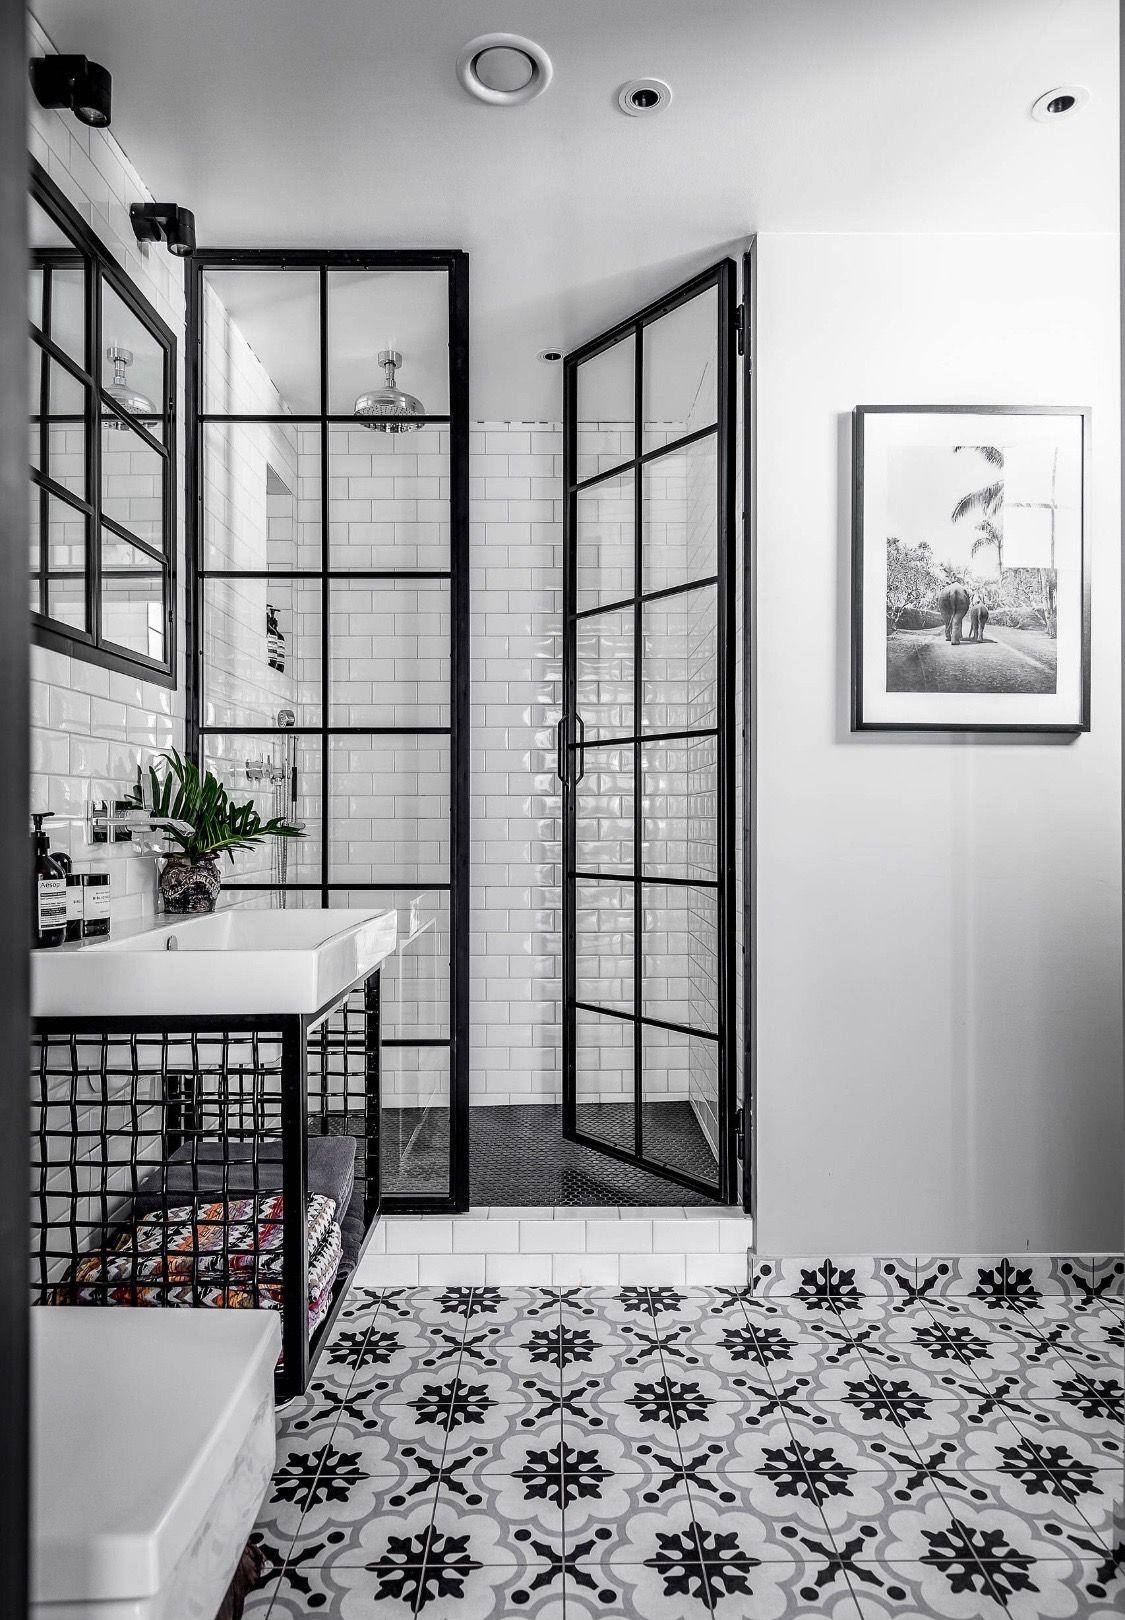 zwart-wit badkamer met aluminium douchewand